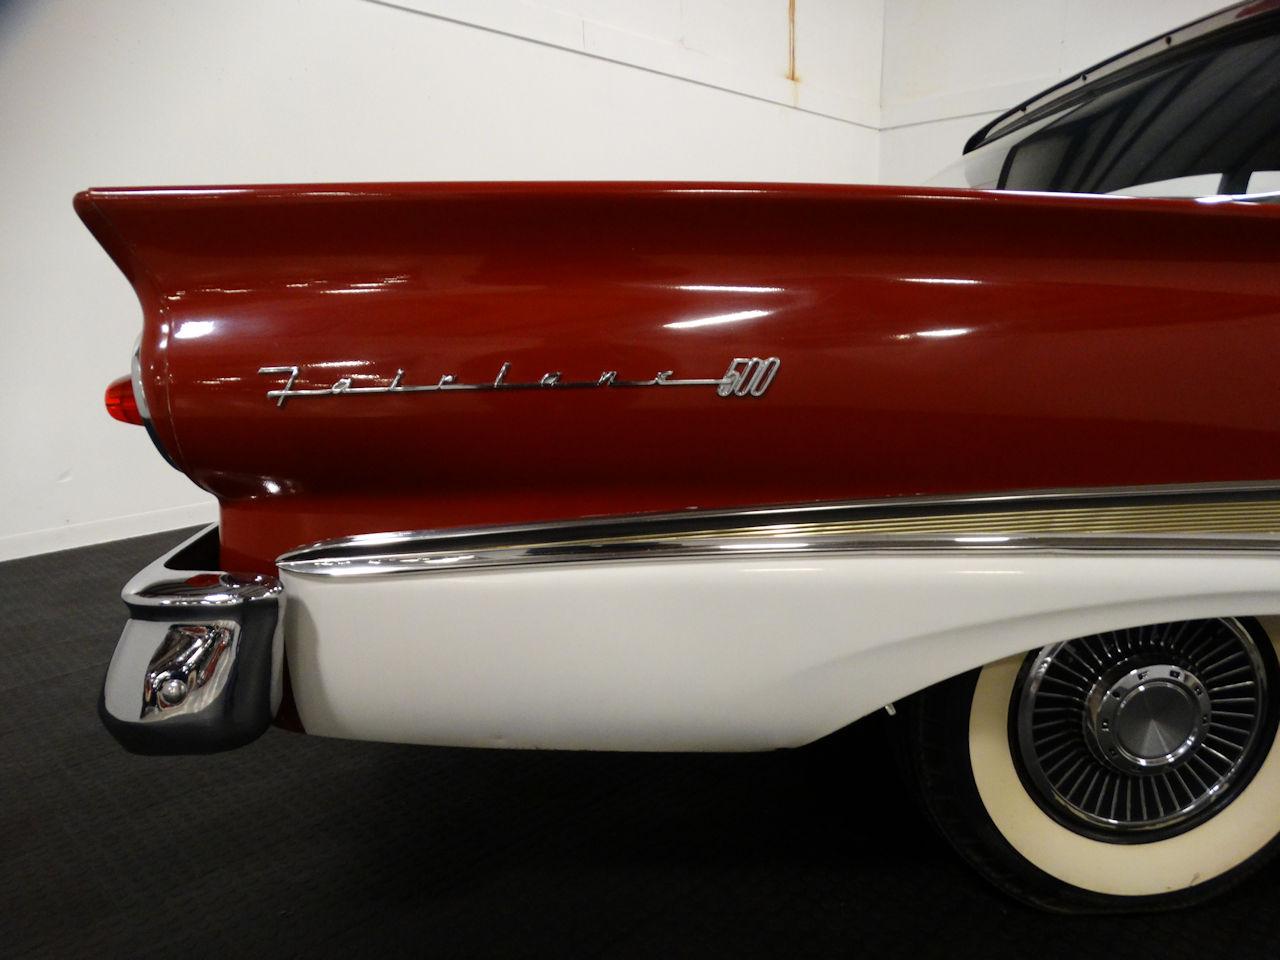 1958 Ford Fairlane 50